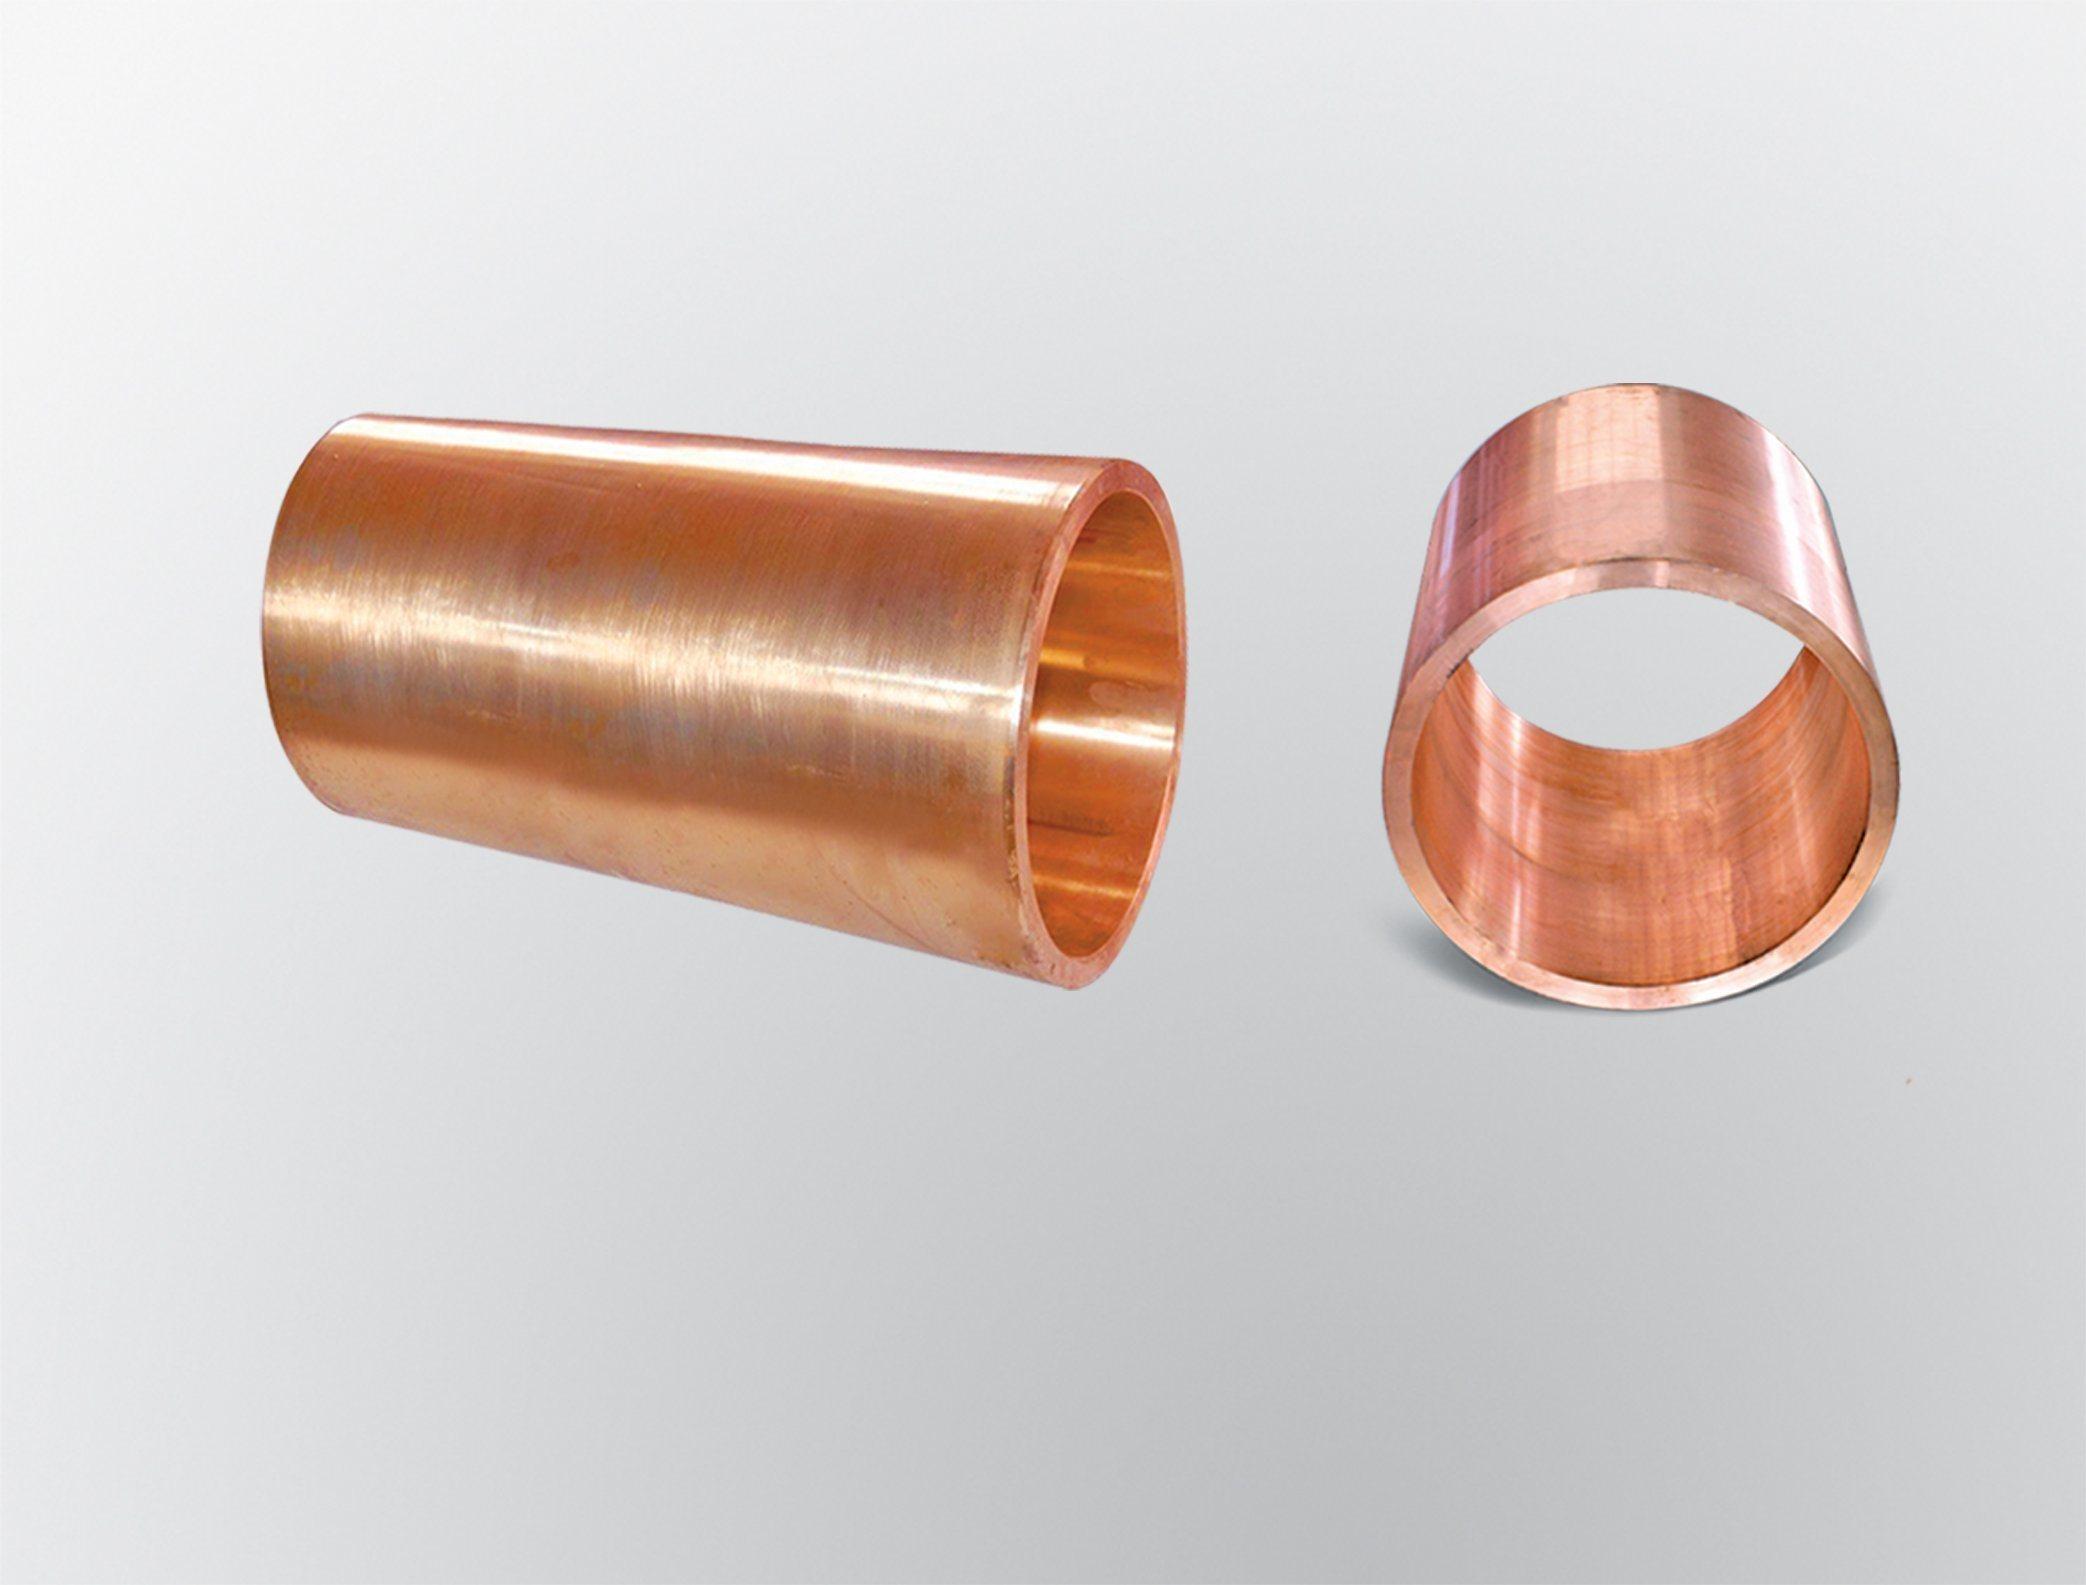 Amorphous Bands/Magnetic Materials Casting Copper Roller